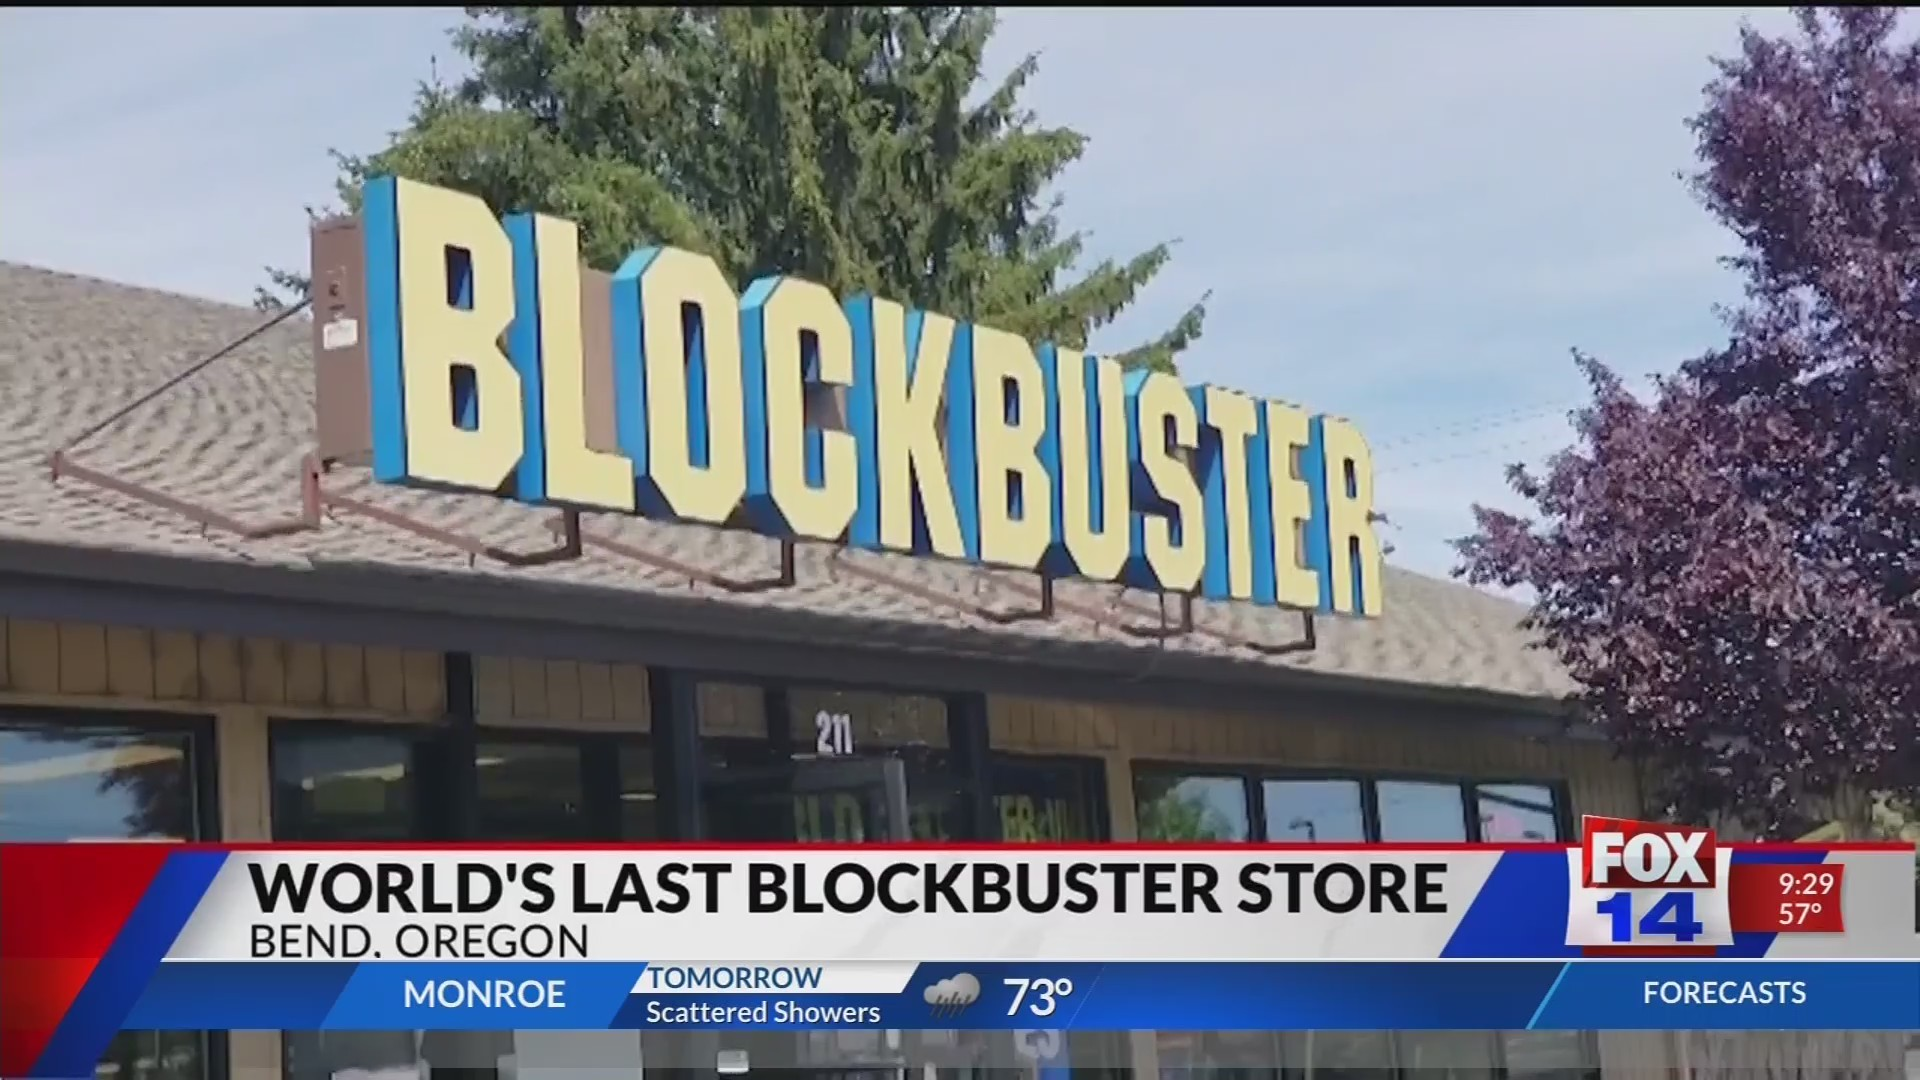 World's last blockbuster store